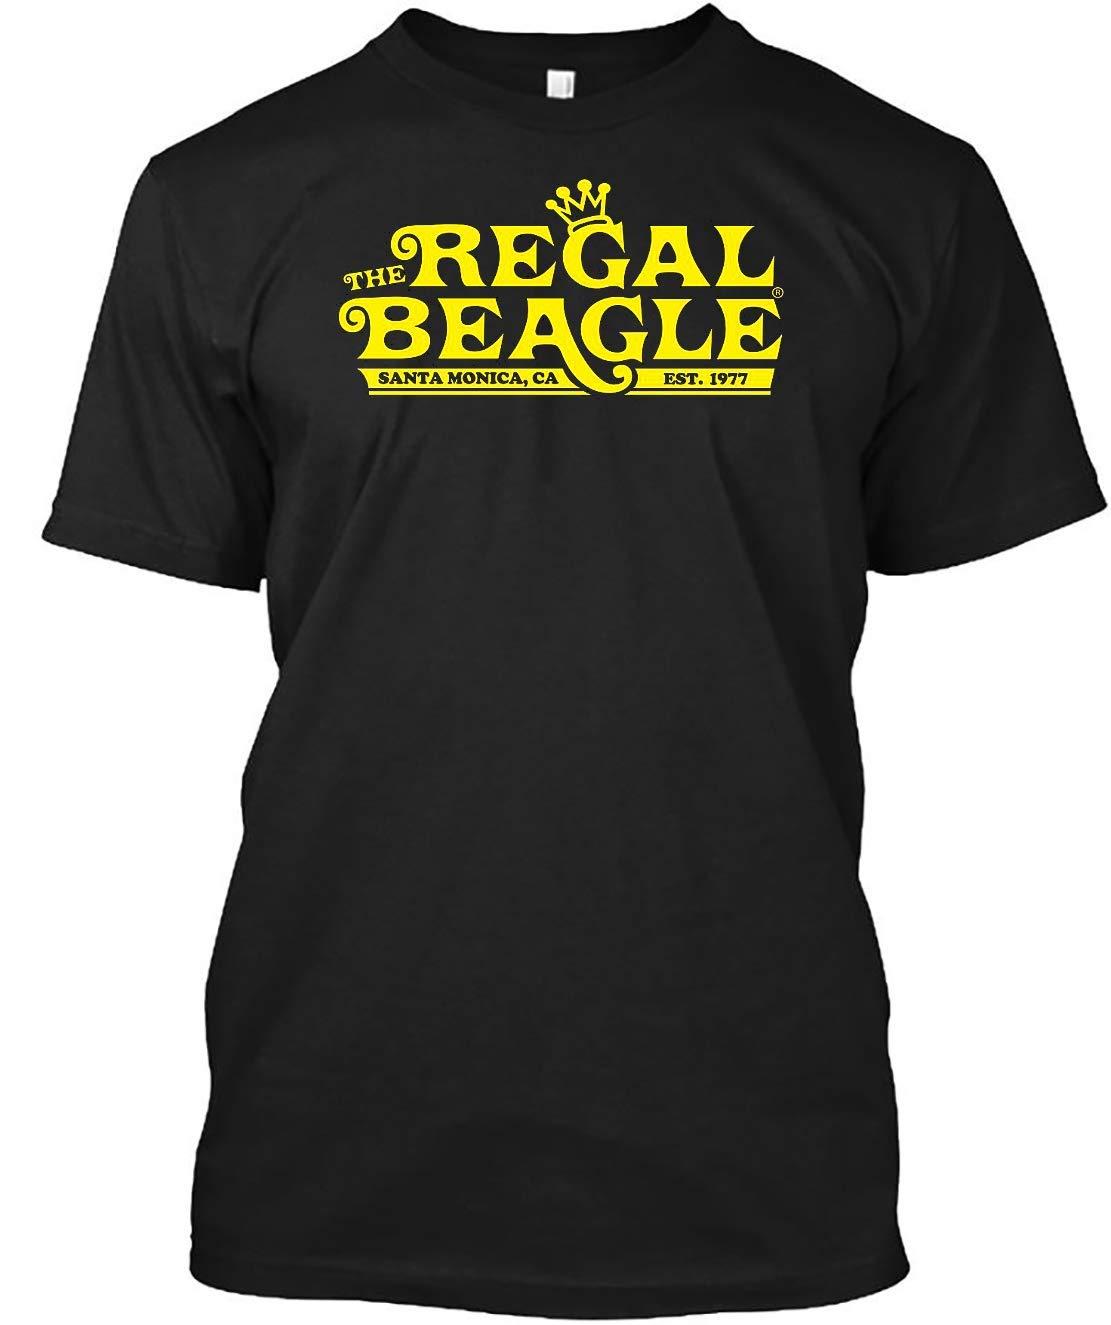 The Regal Beagle Three S Company Customized Handmade For Unisex Shirts